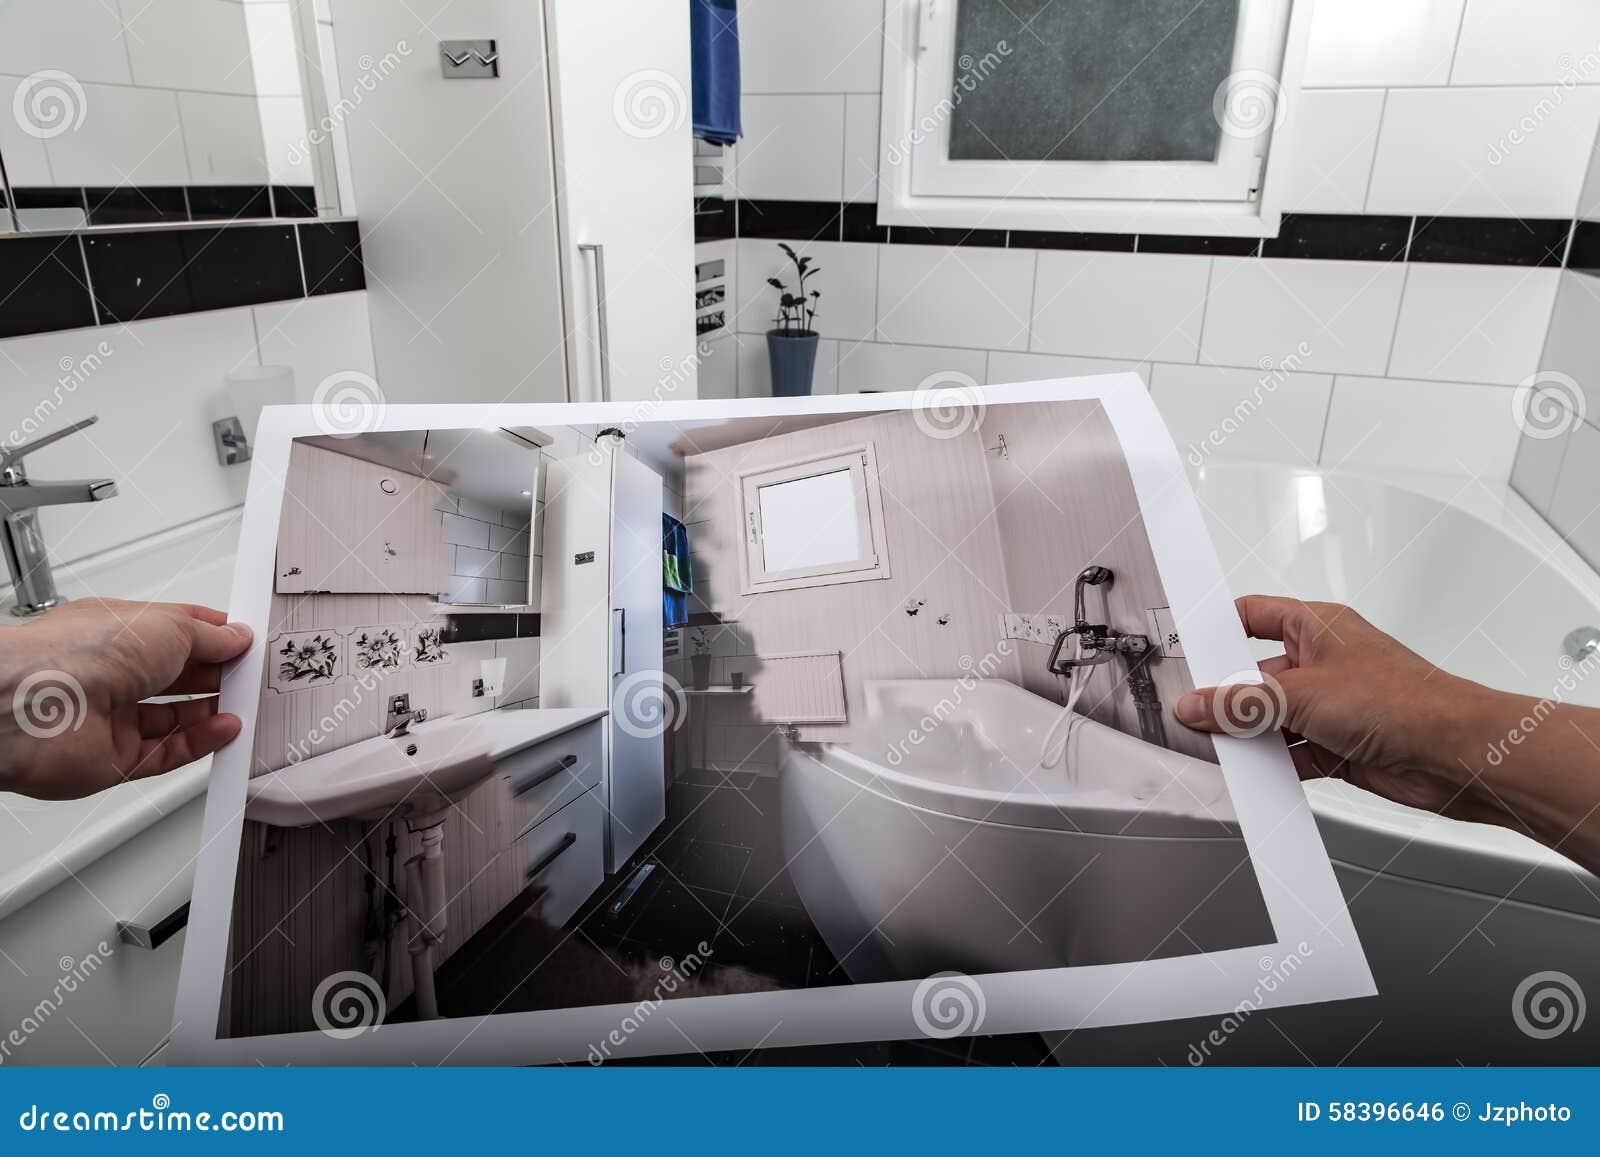 Modern Bathroom Designs Yield Big Returns In Comfort And: Bathroom Royalty-Free Stock Image